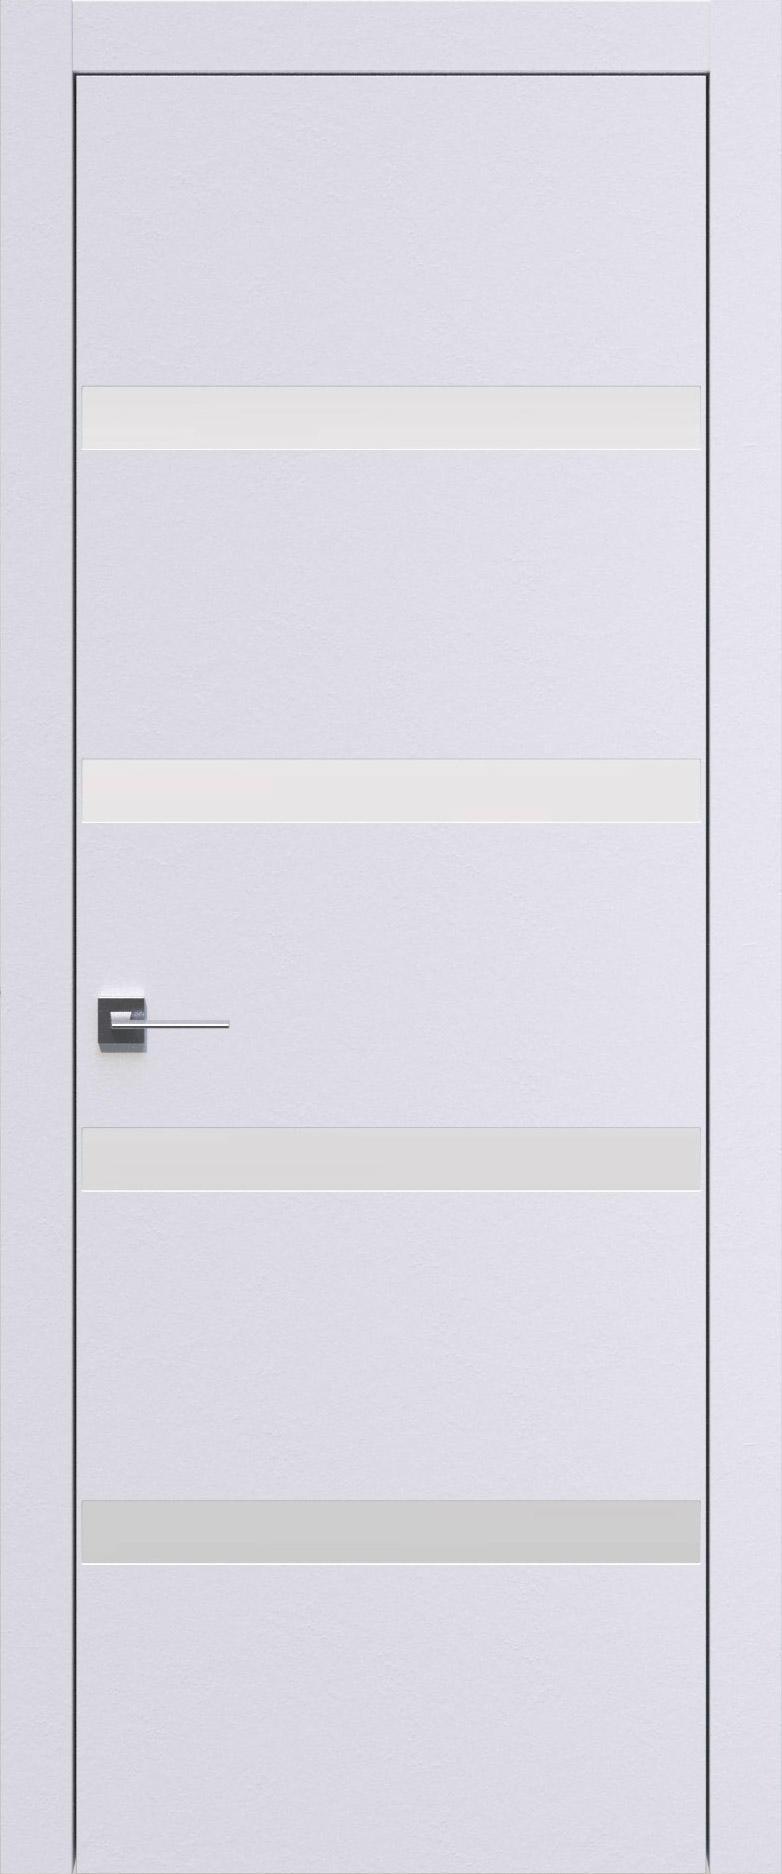 Tivoli Д-4 цвет - Арктик белый Без стекла (ДГ)